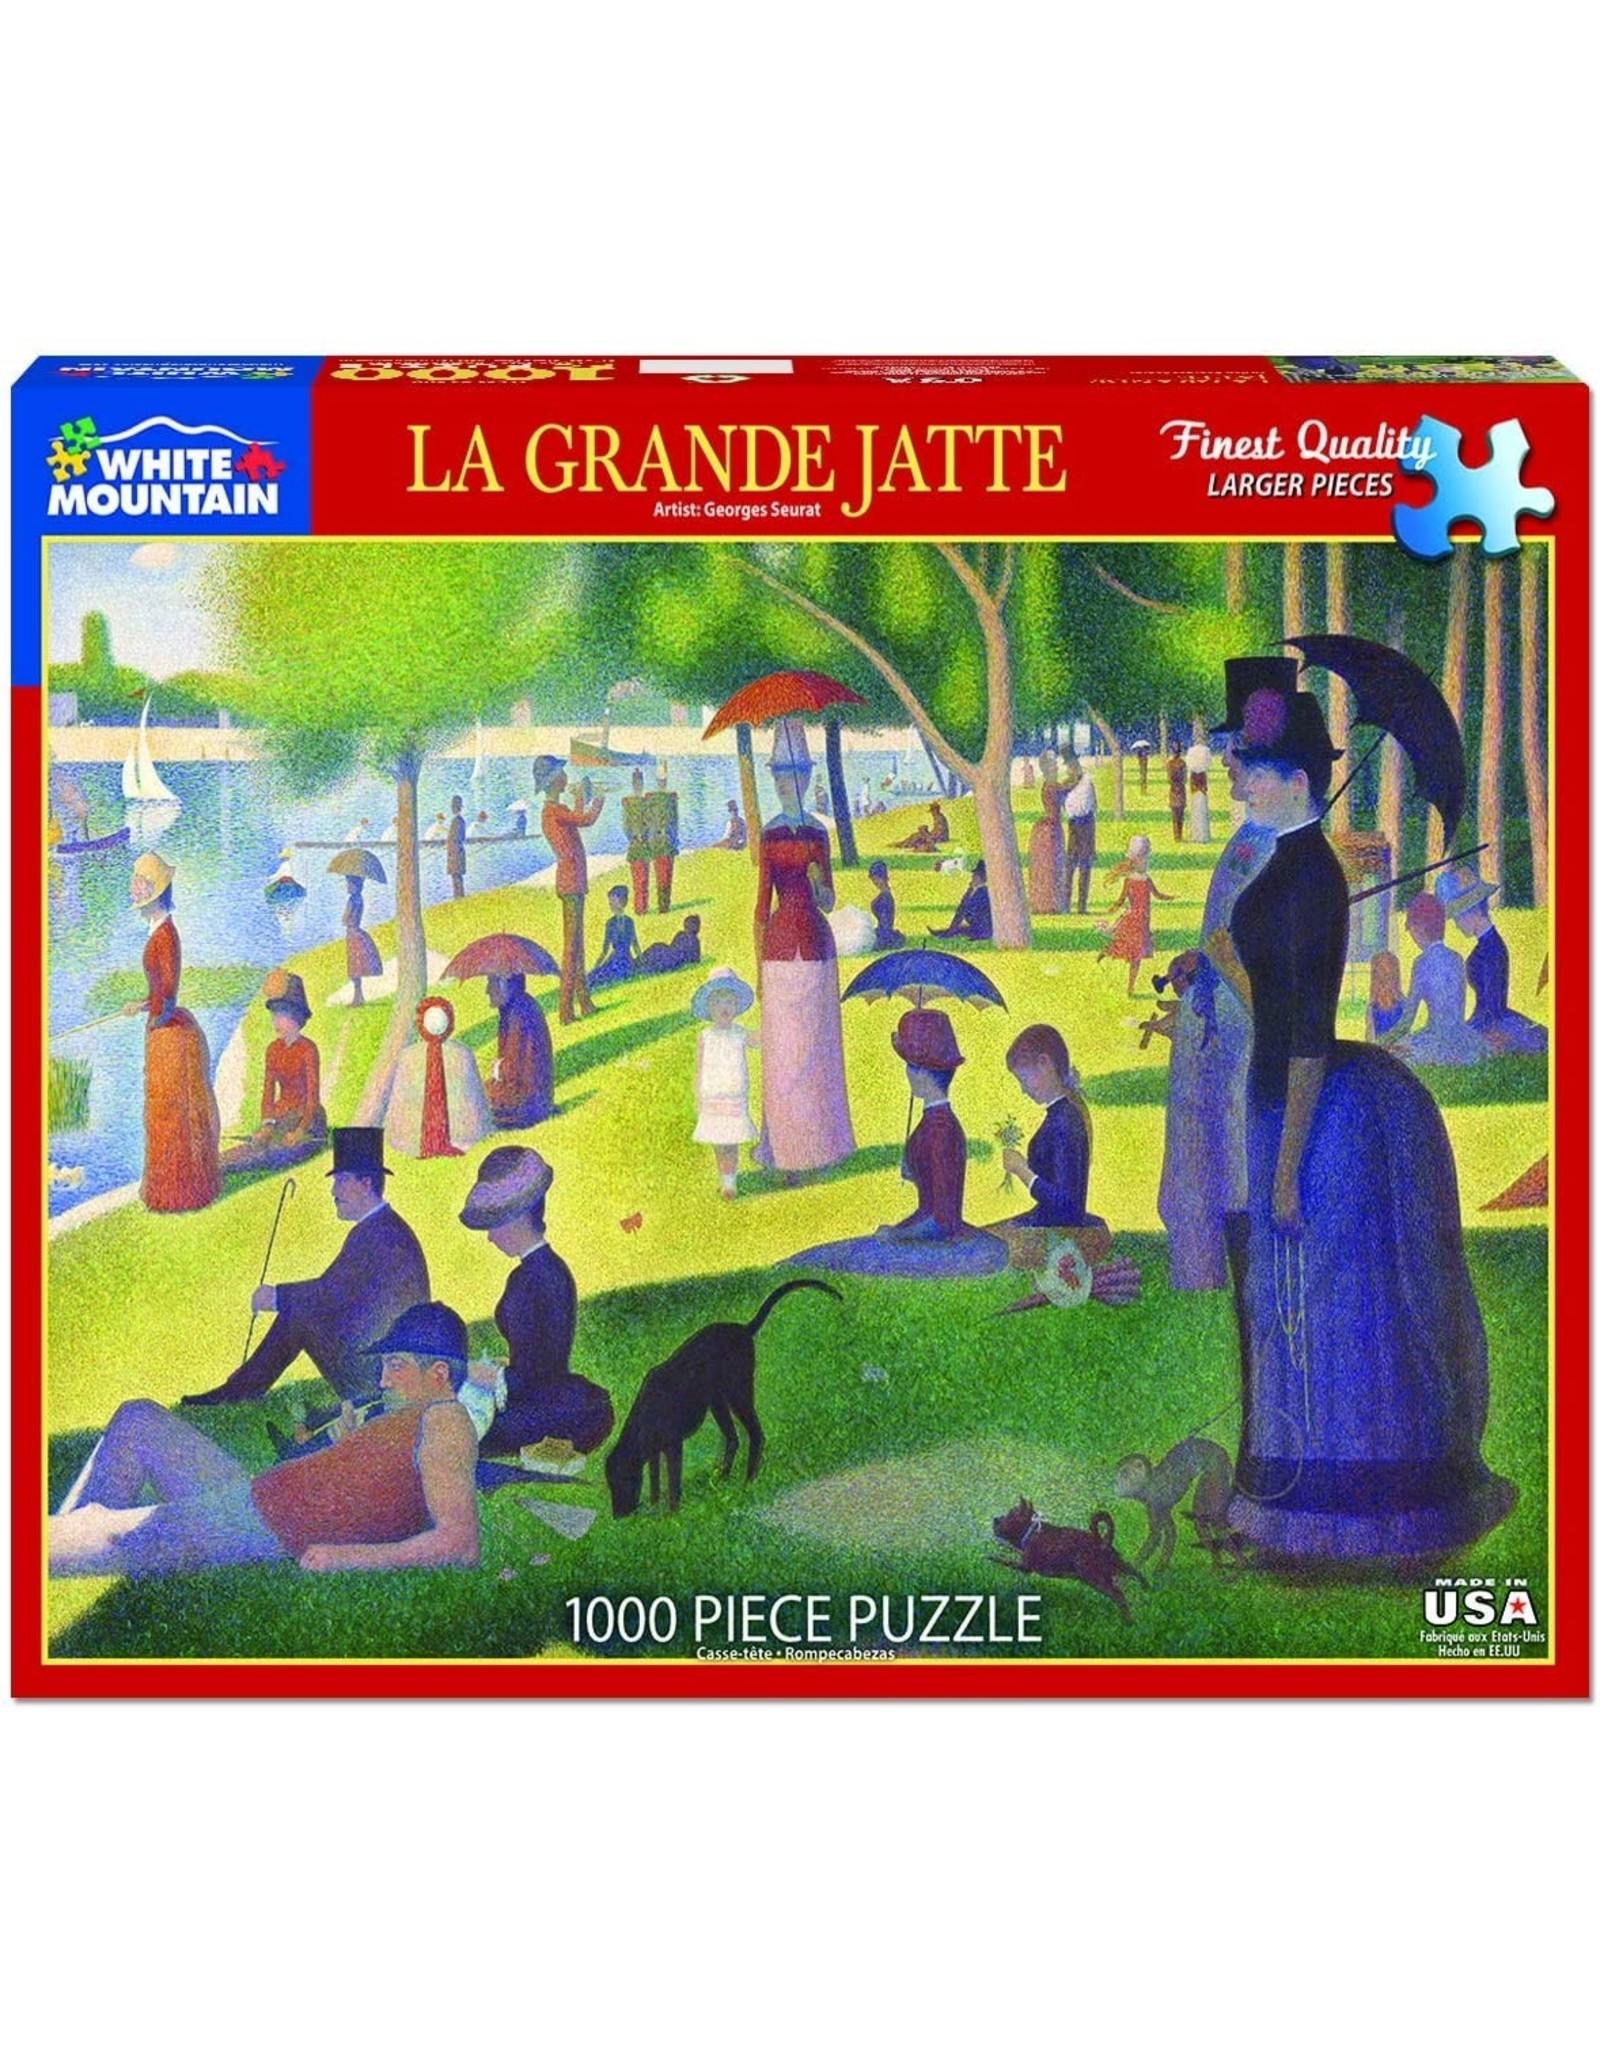 "White Mountain Puzzle ""La Grande Jatte"" 1000 Piece Puzzle"